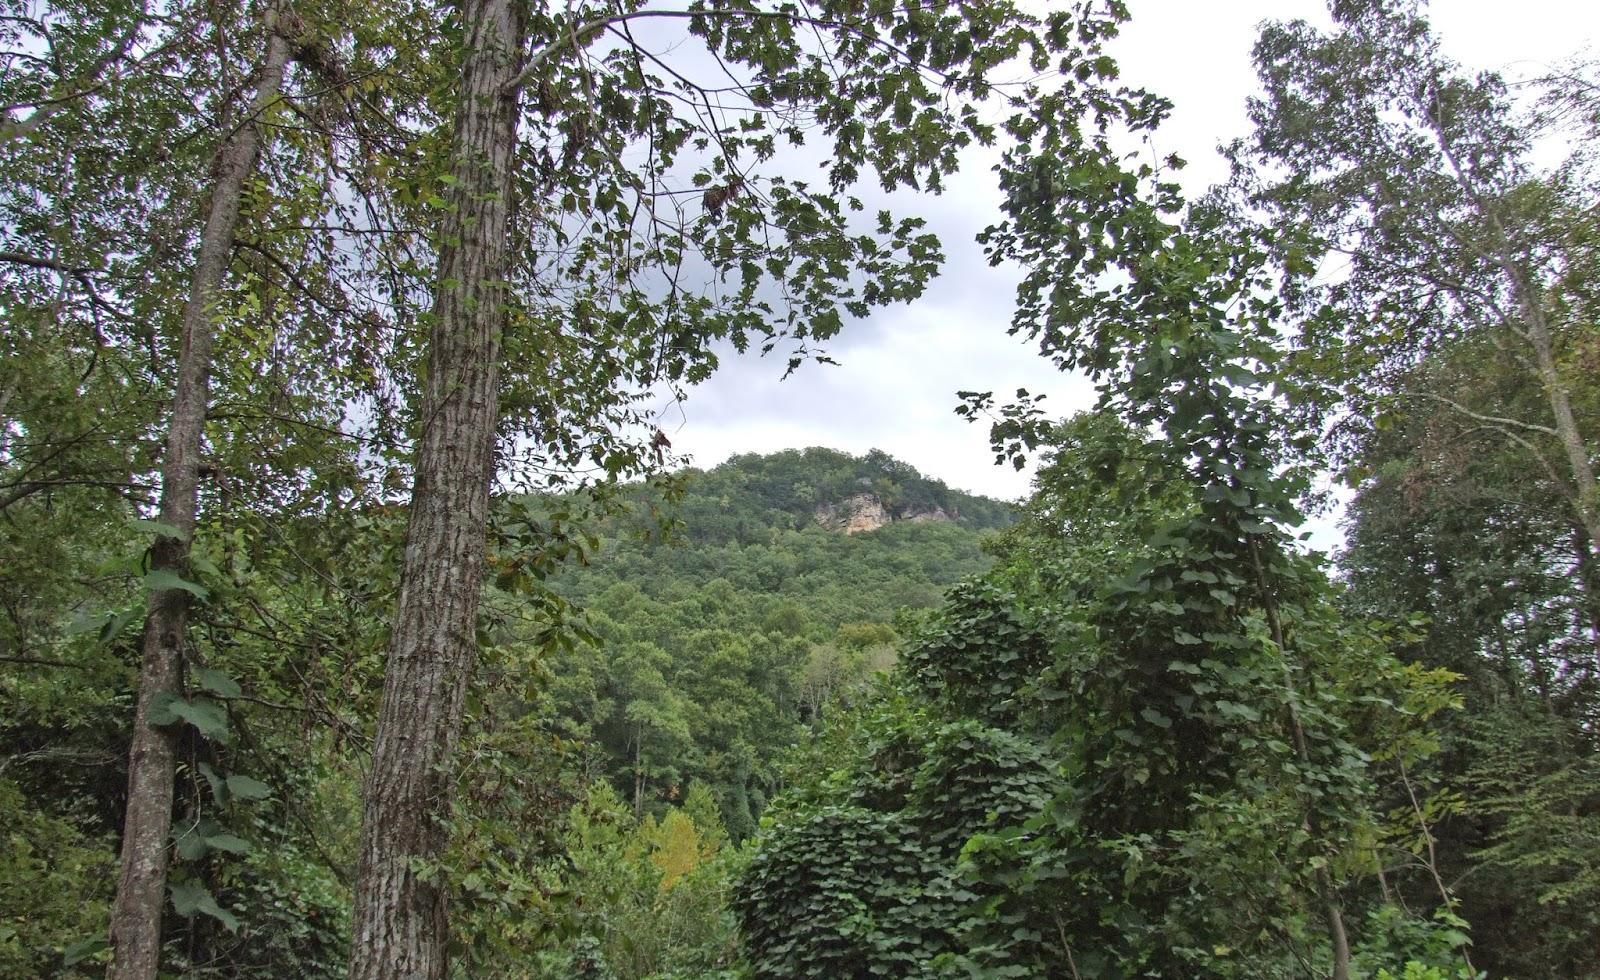 cumberland gap buddhist personals Big stone gap, va – mountain empire community college held.